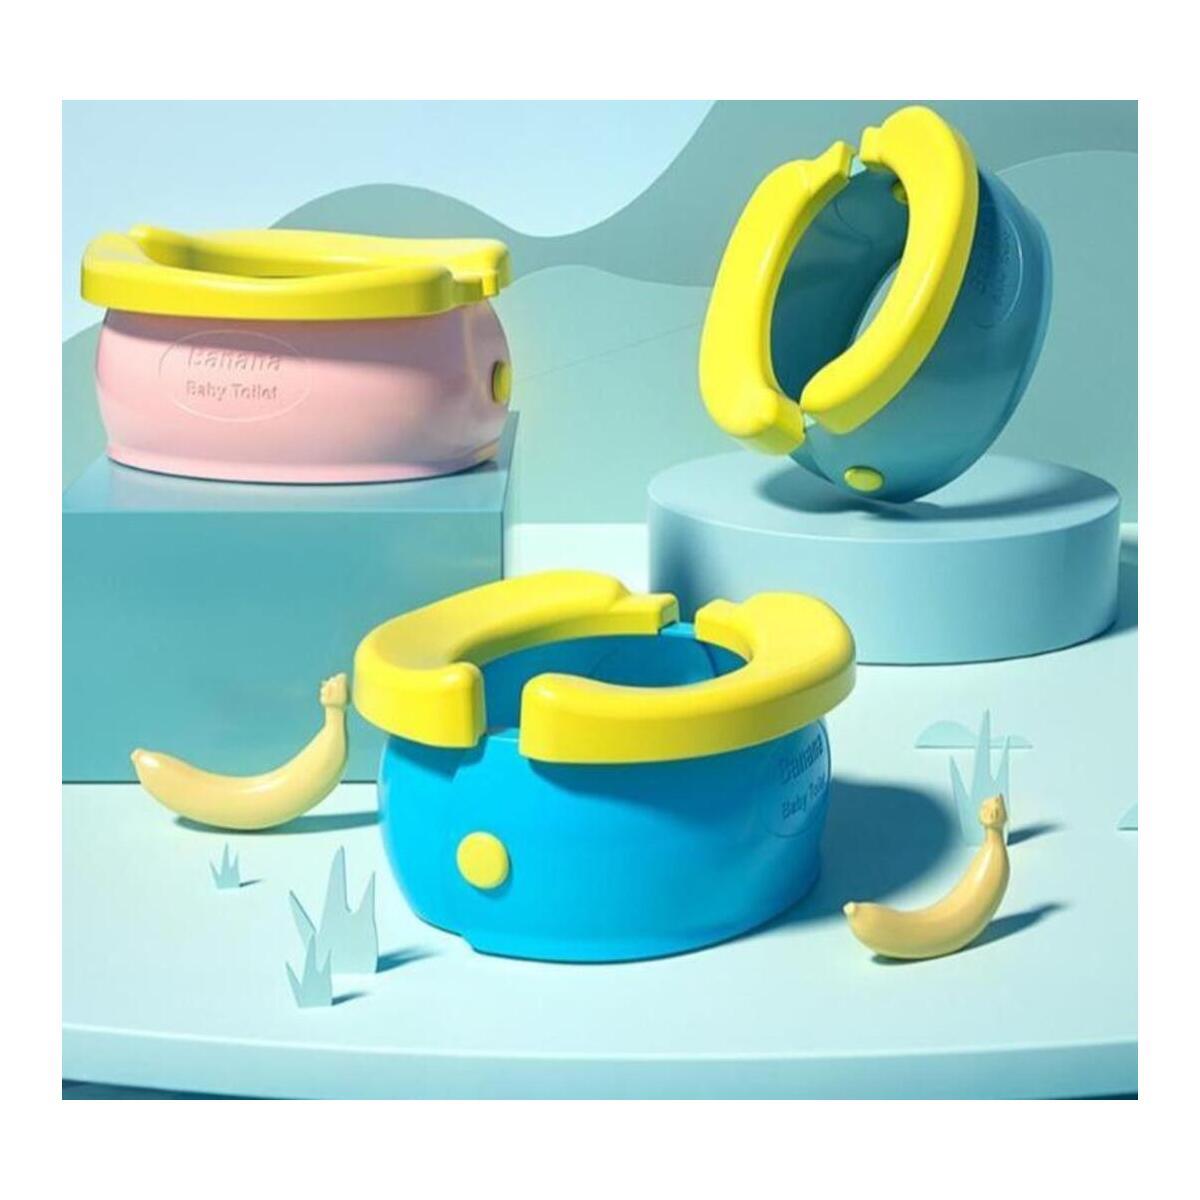 Portable Training Seat Baby Banana Potty Toddler Friendly Toilet